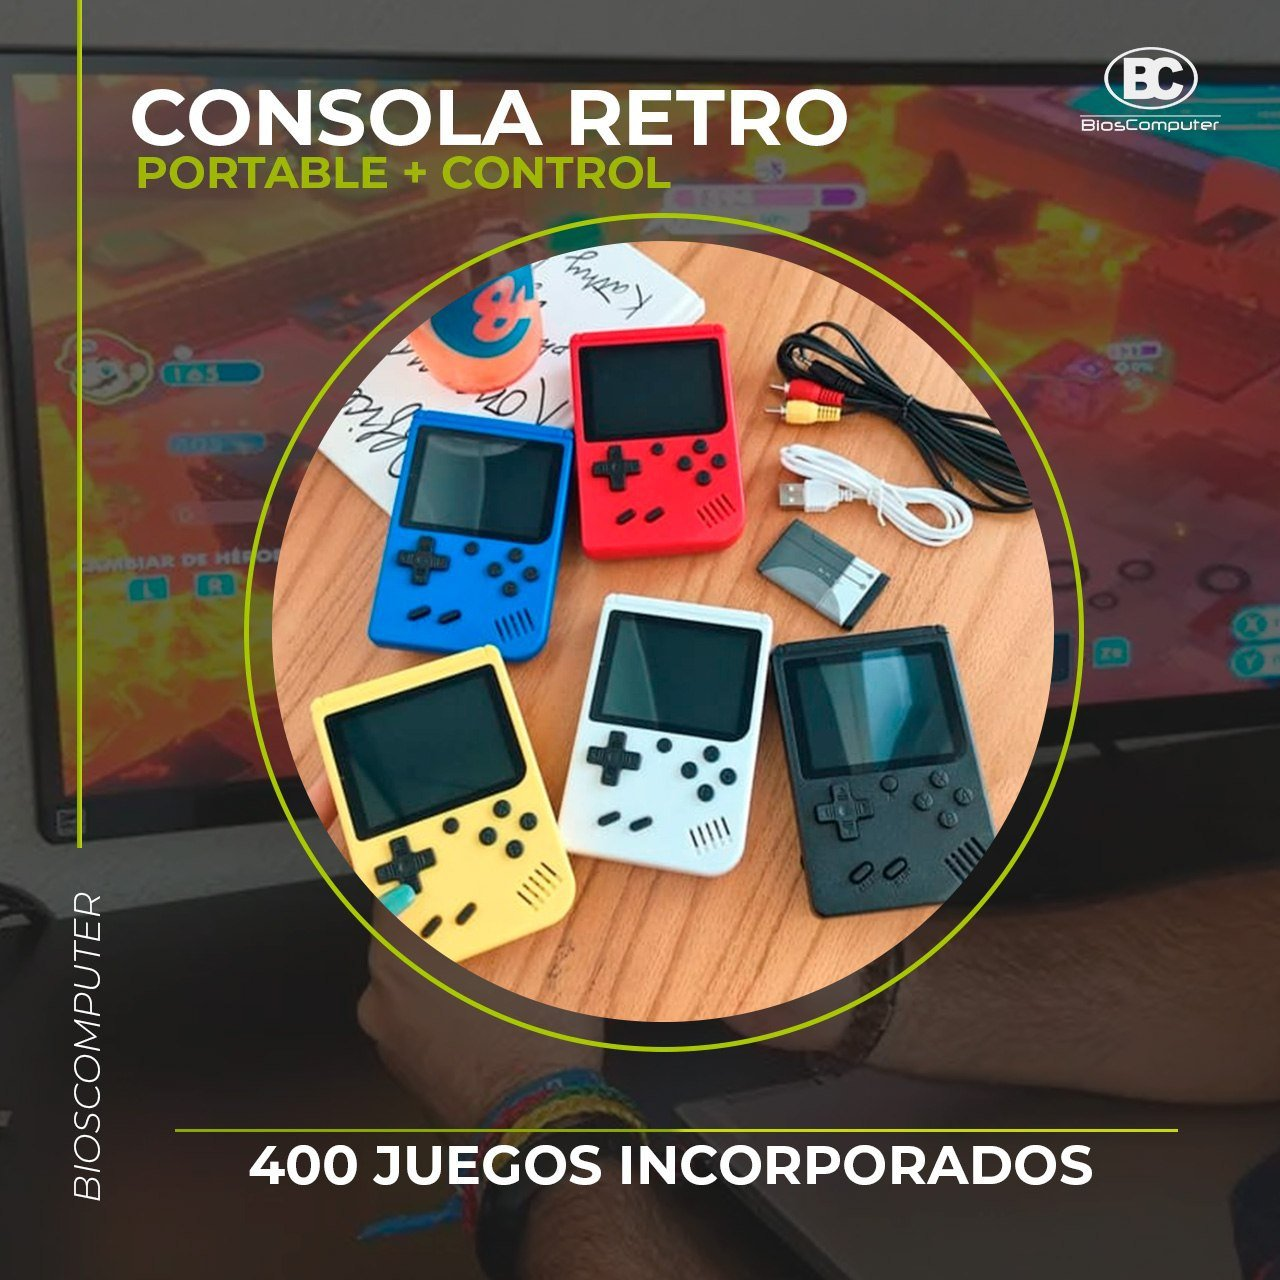 CONSOLA RETRO PORTABLE